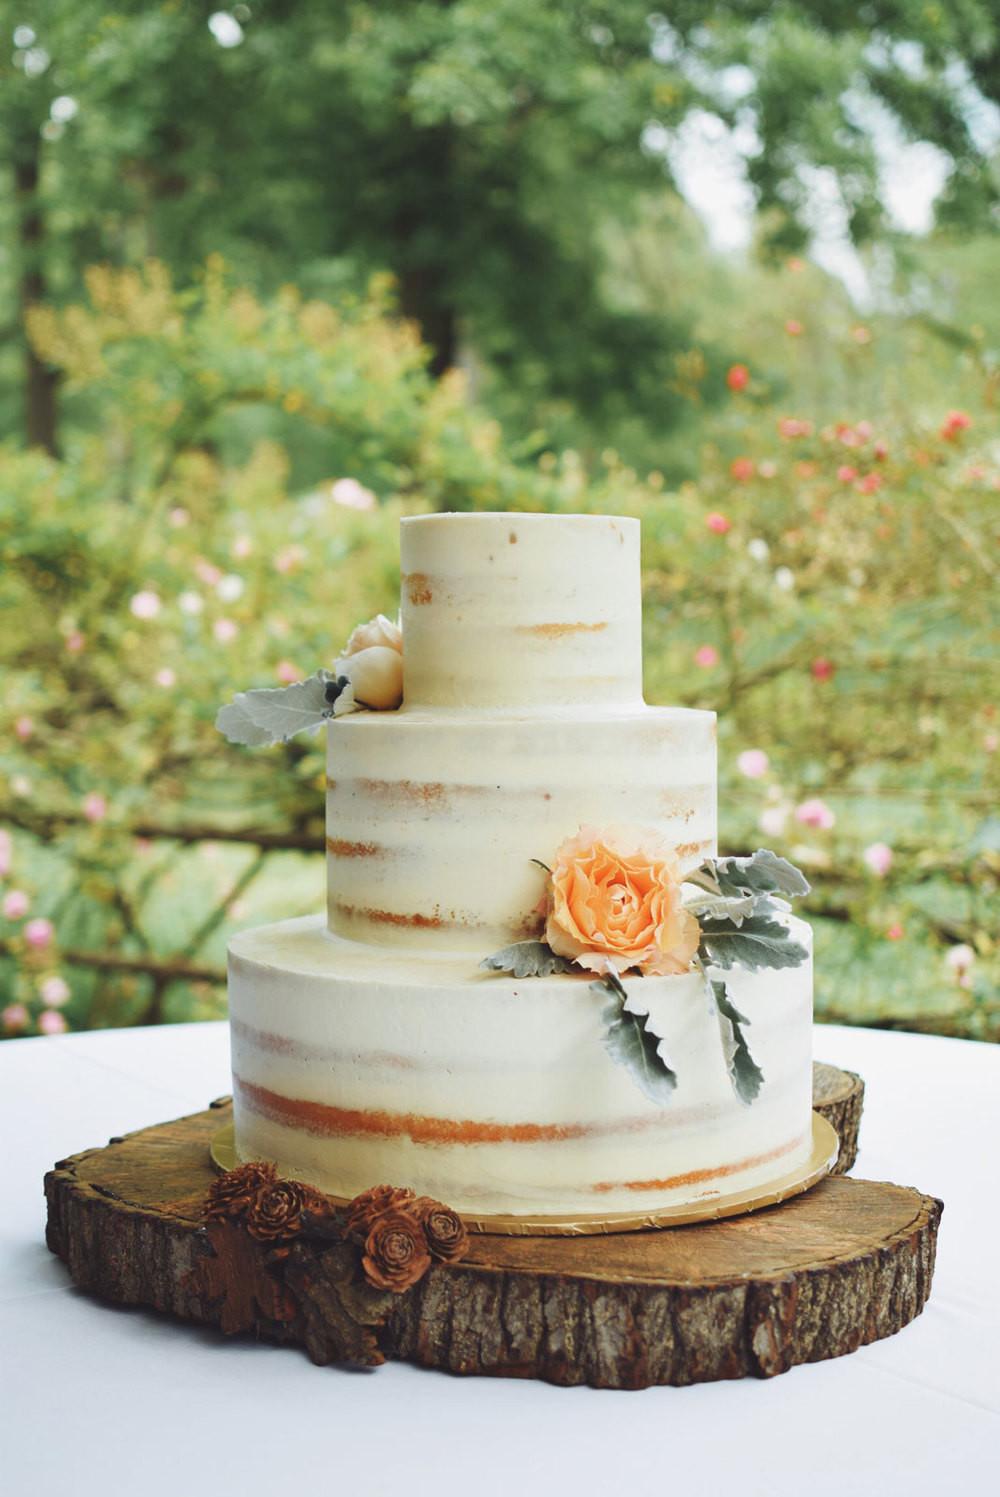 Bakery Wedding Cakes  Wedding Cakes — Suárez Bakery